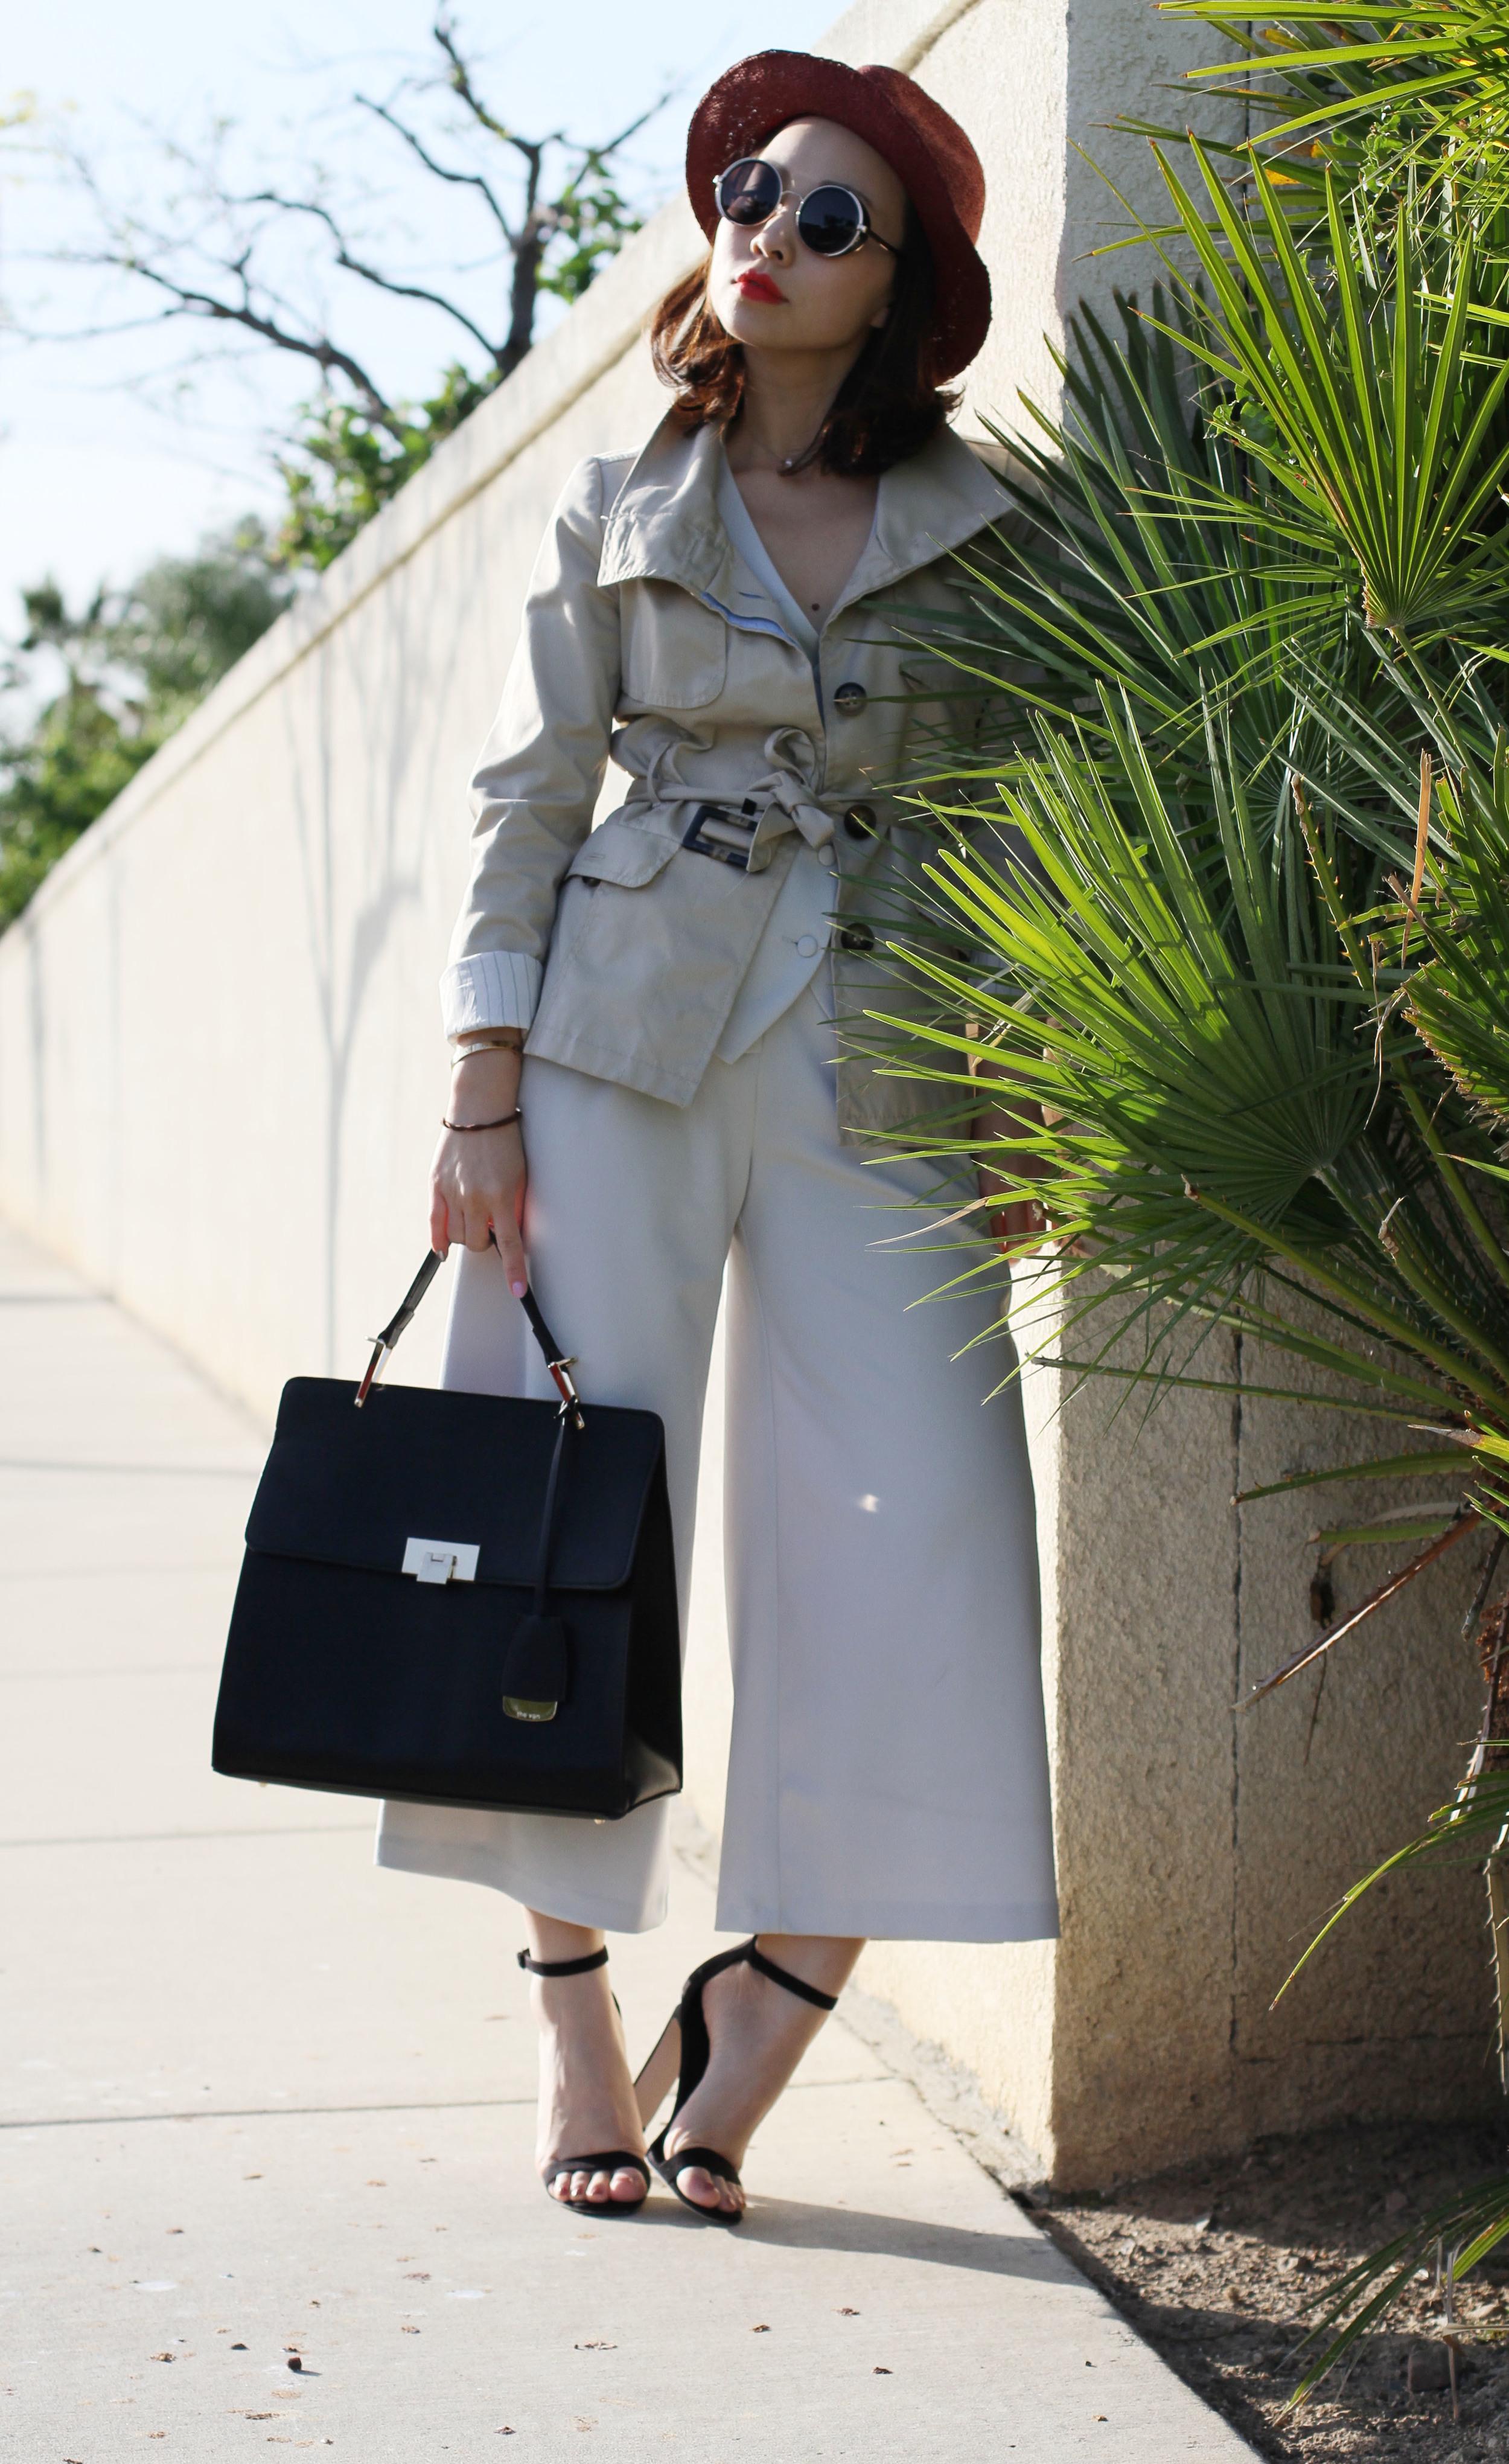 petite 2 piece set outfit 3.jpg